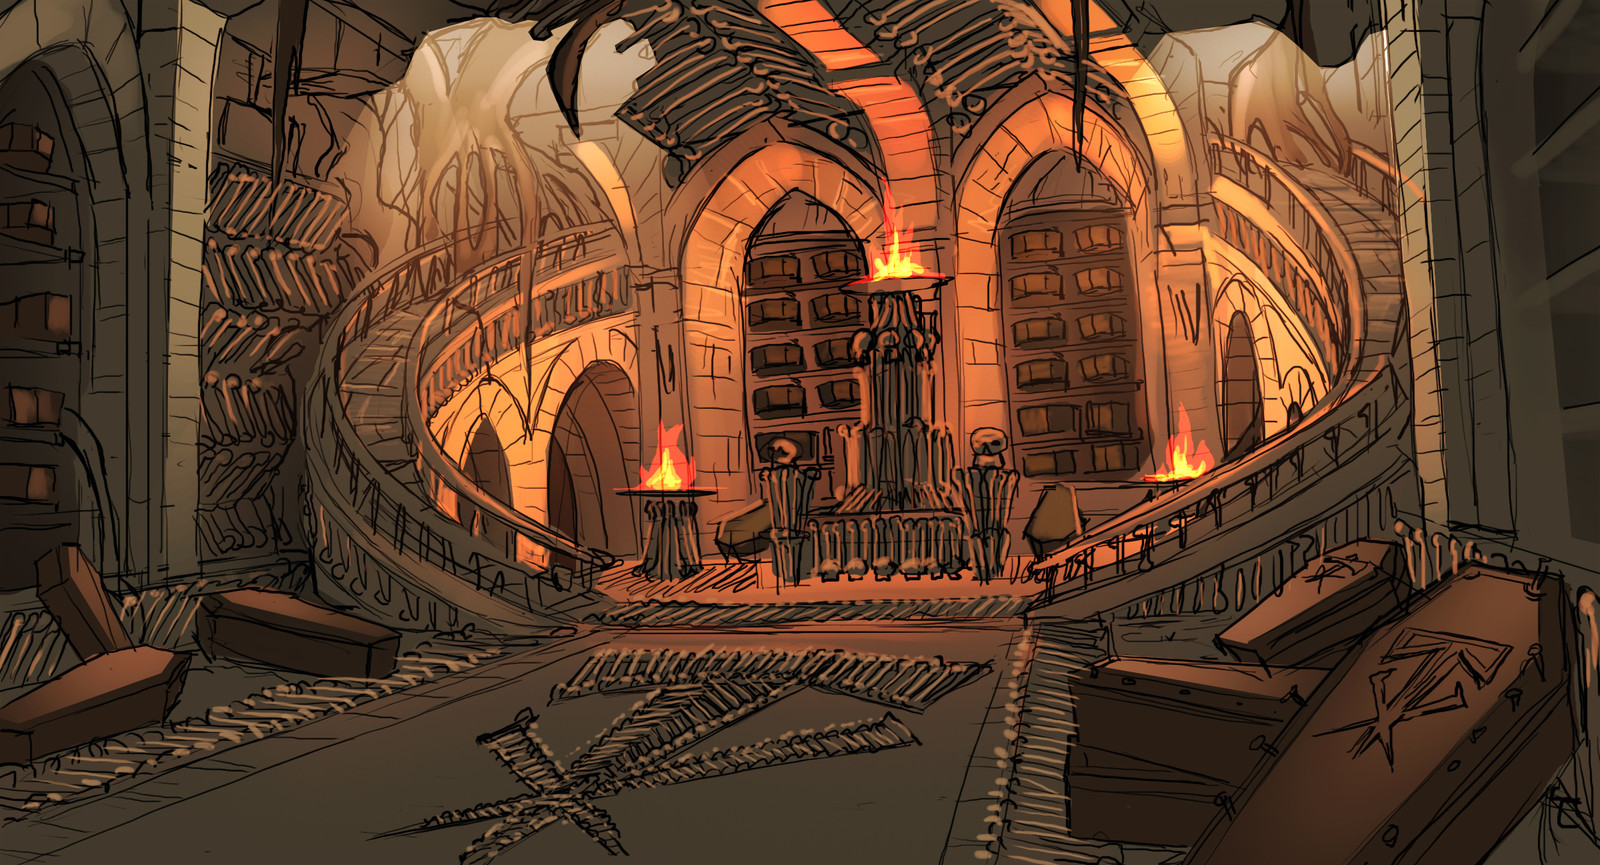 Boneworld